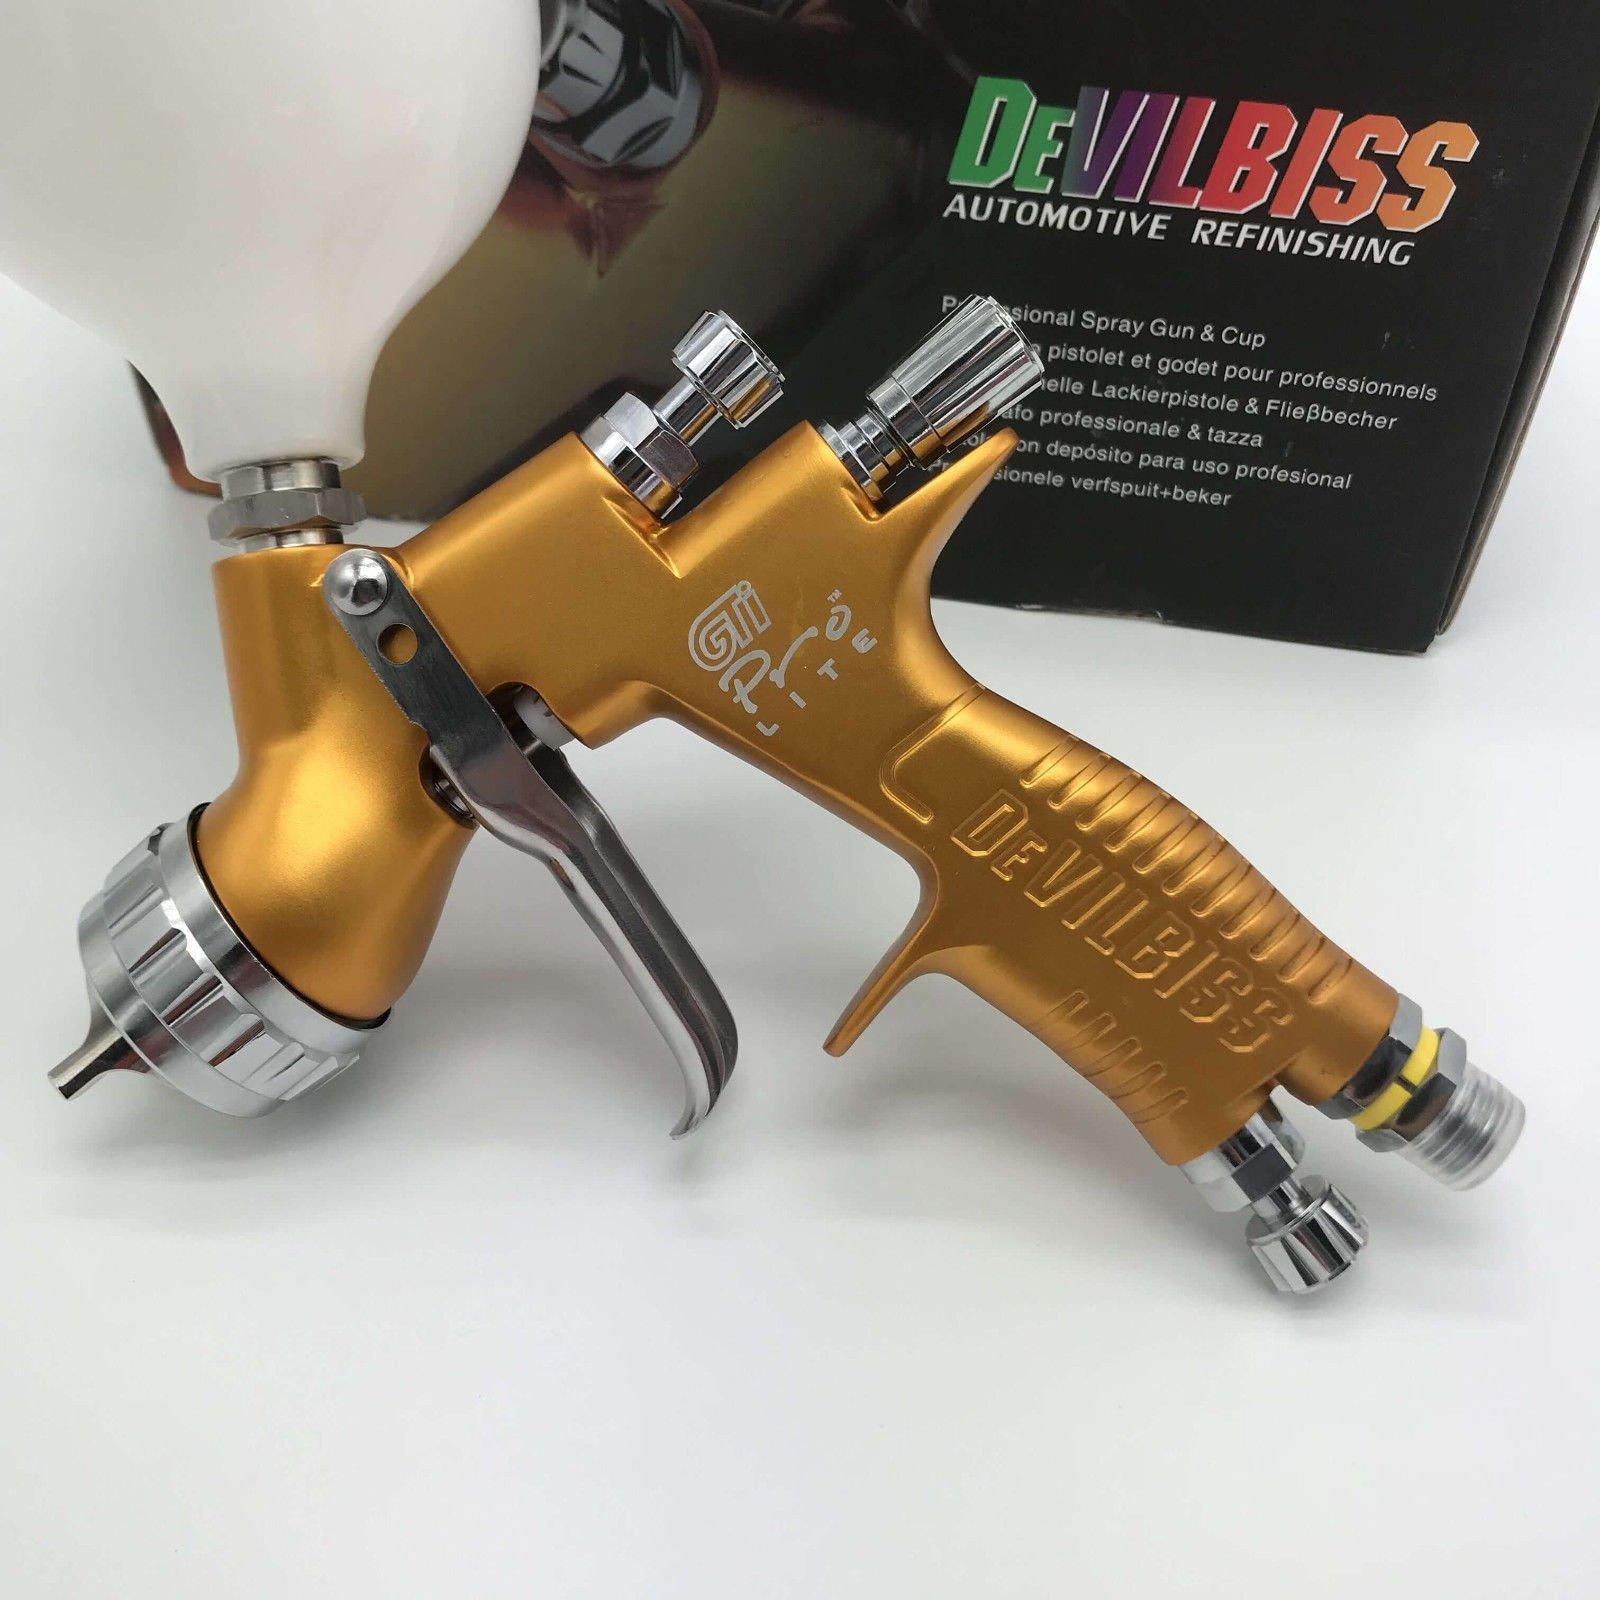 devilbes Professional Sparyer GTI PRO LITE Gold 1.3mm Nozzle w/t Cup TE20 Cap Car Paint Tool Pistol Spray Gun by devilbes (Image #1)